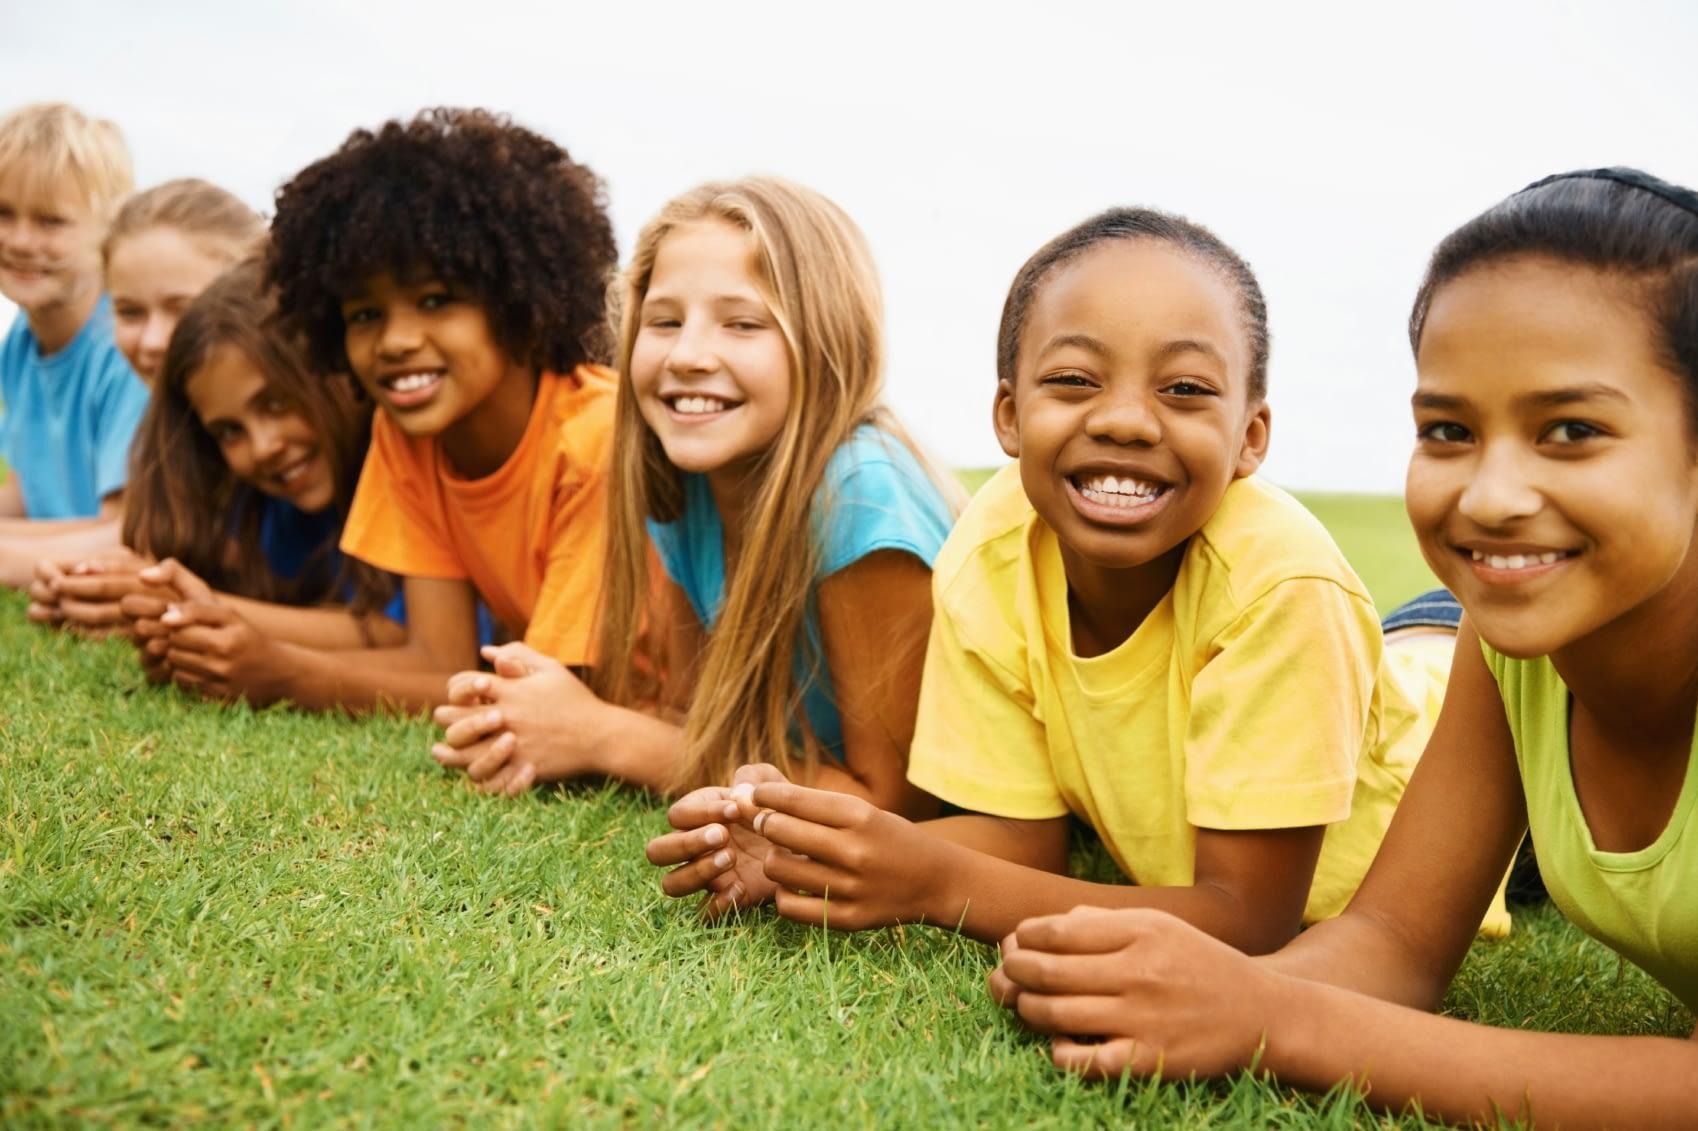 multicultural-children-laying-in-grass_0.jpg